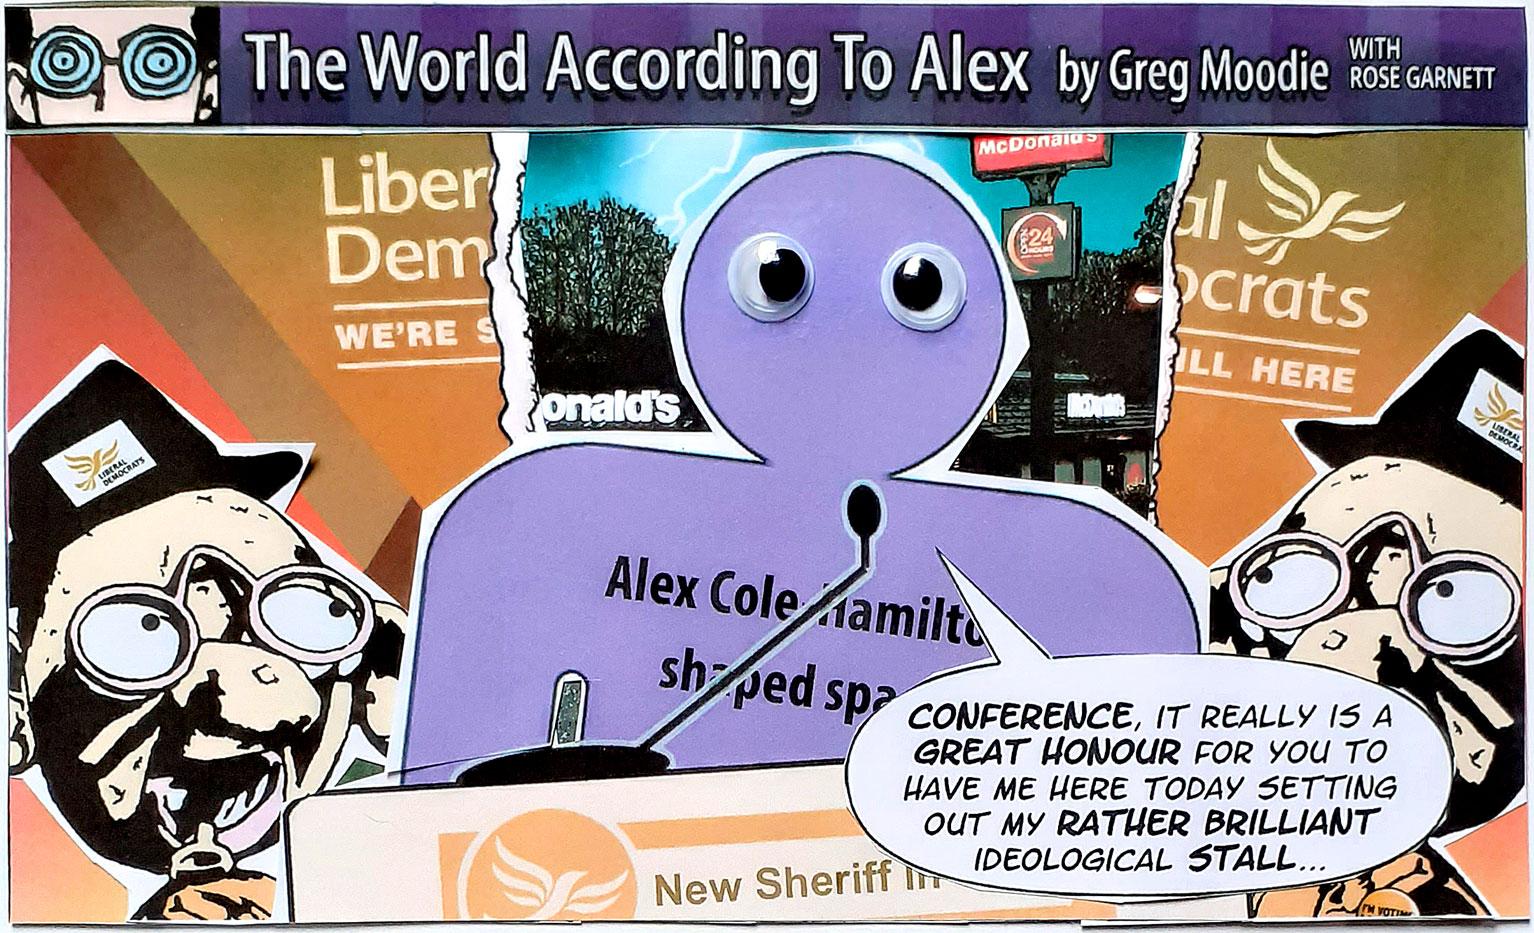 The World According To Alex